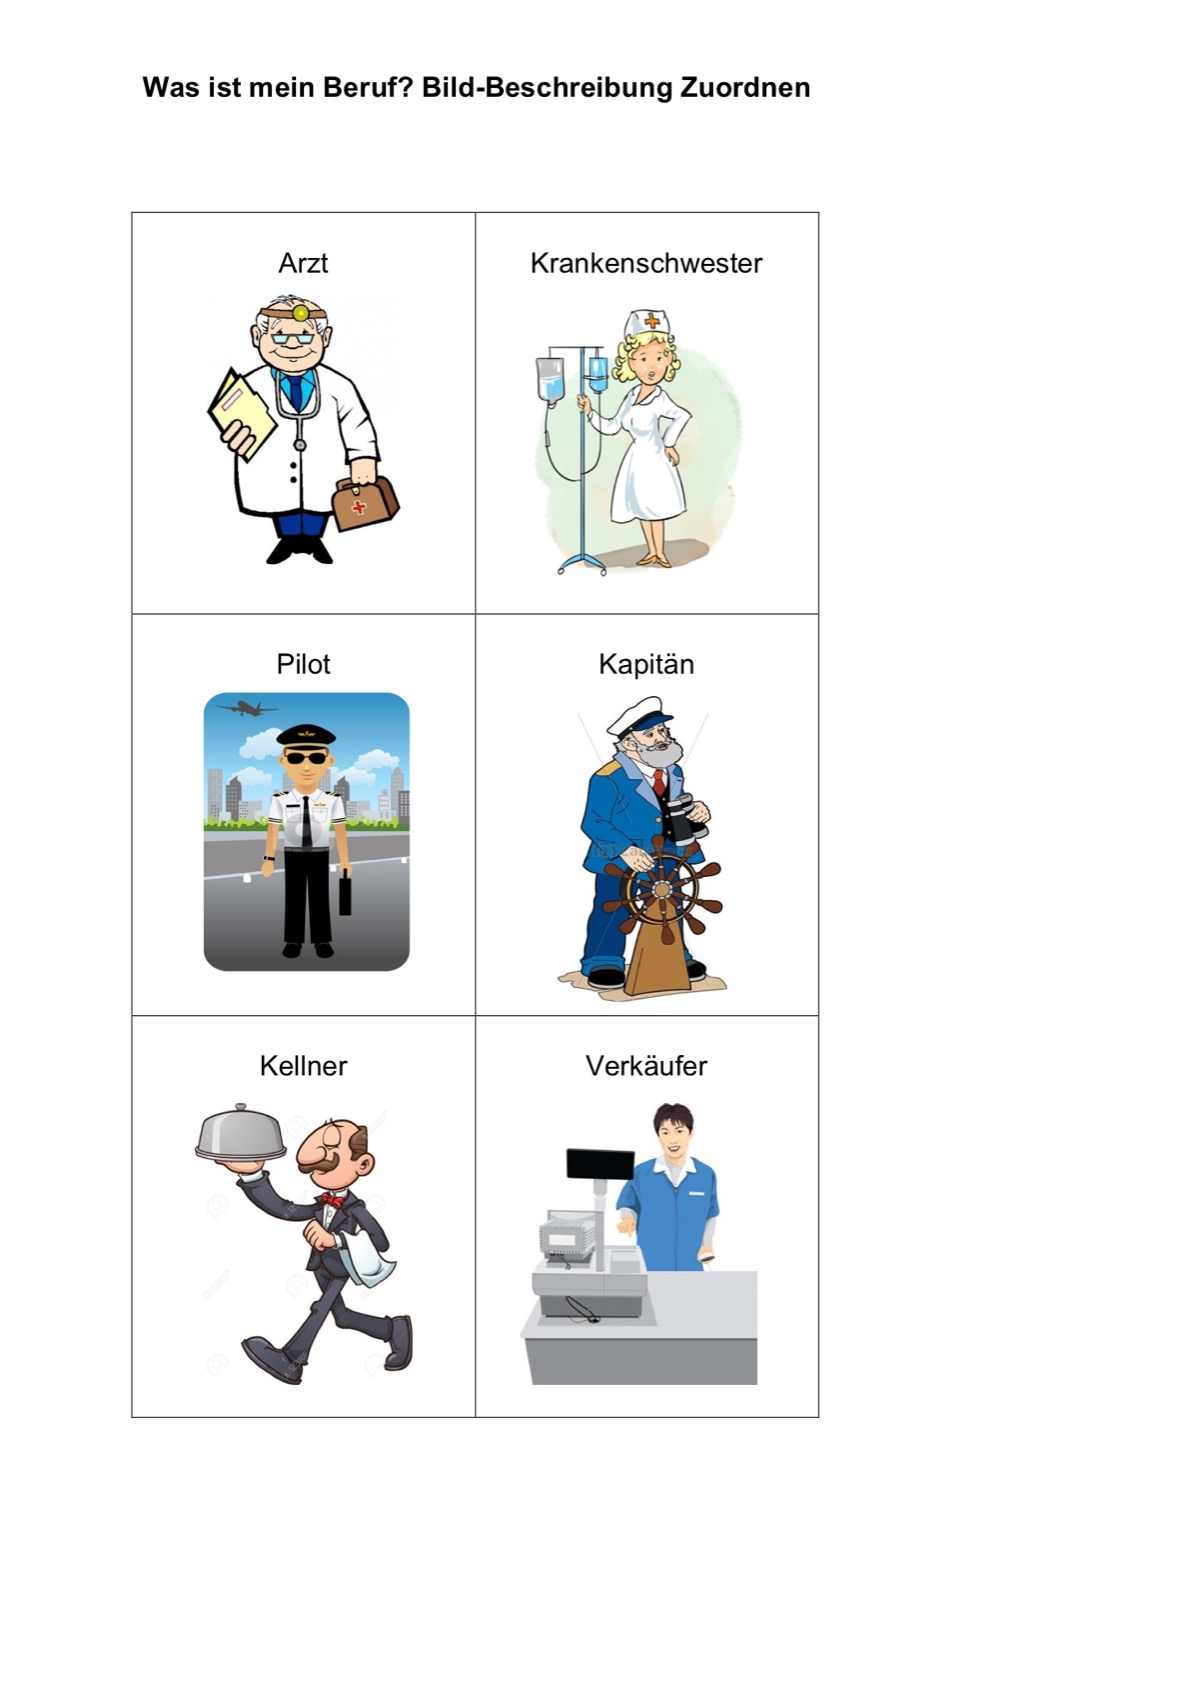 Berufe zuordnen - Aphasie - madoo.net